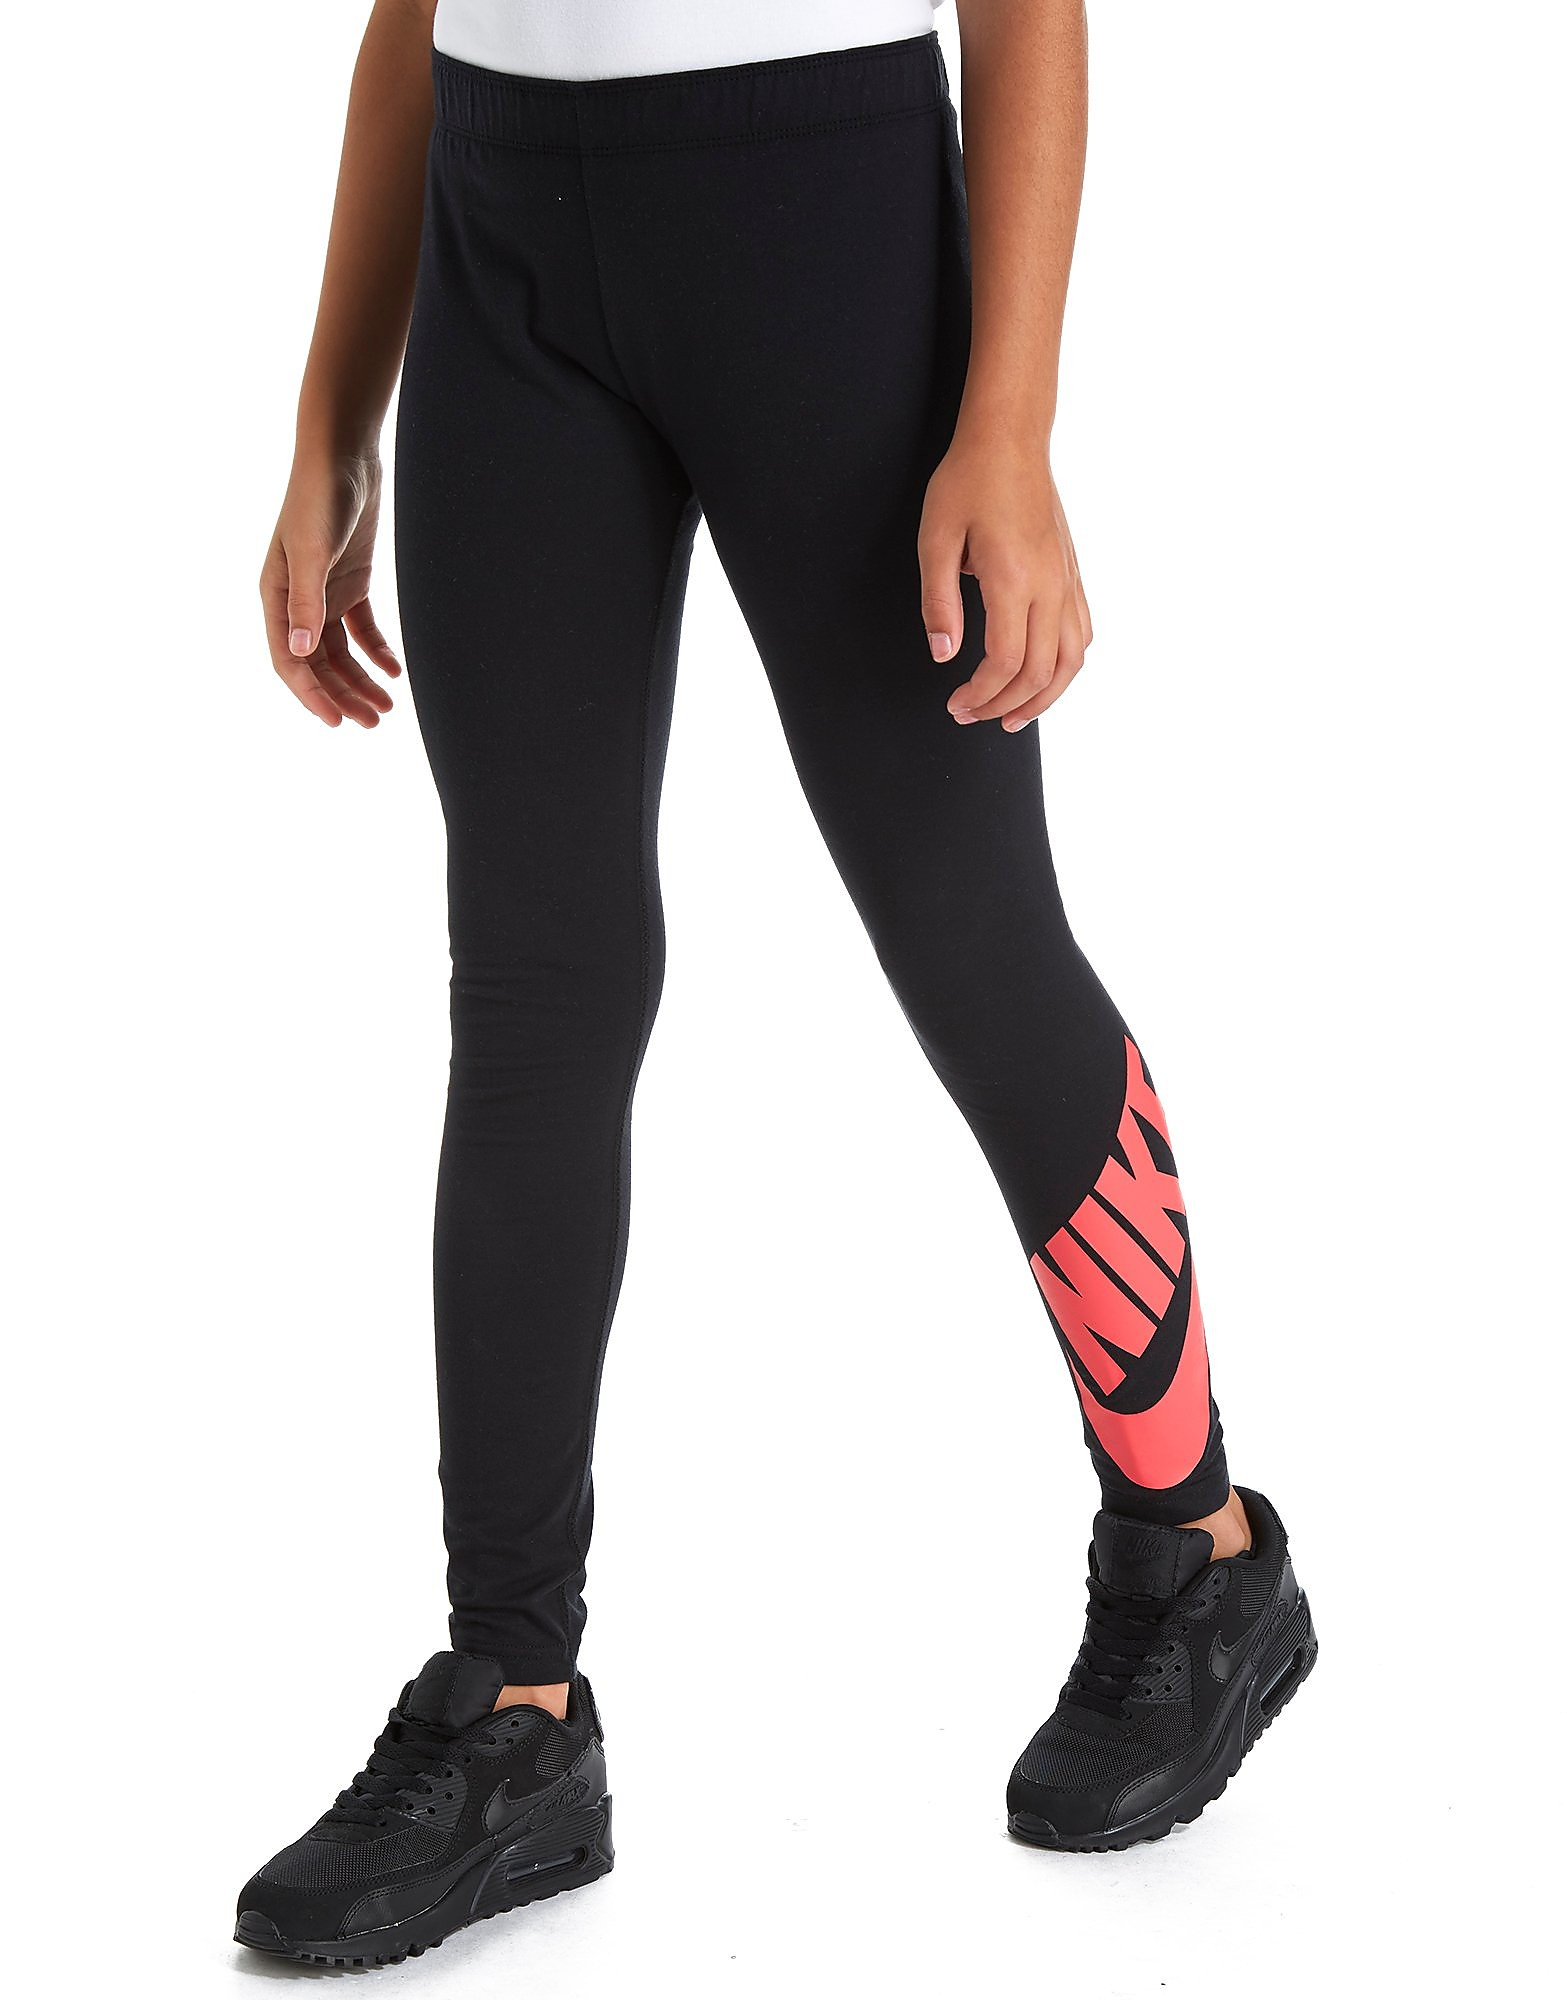 Nike Dry Corp Tights Girls'